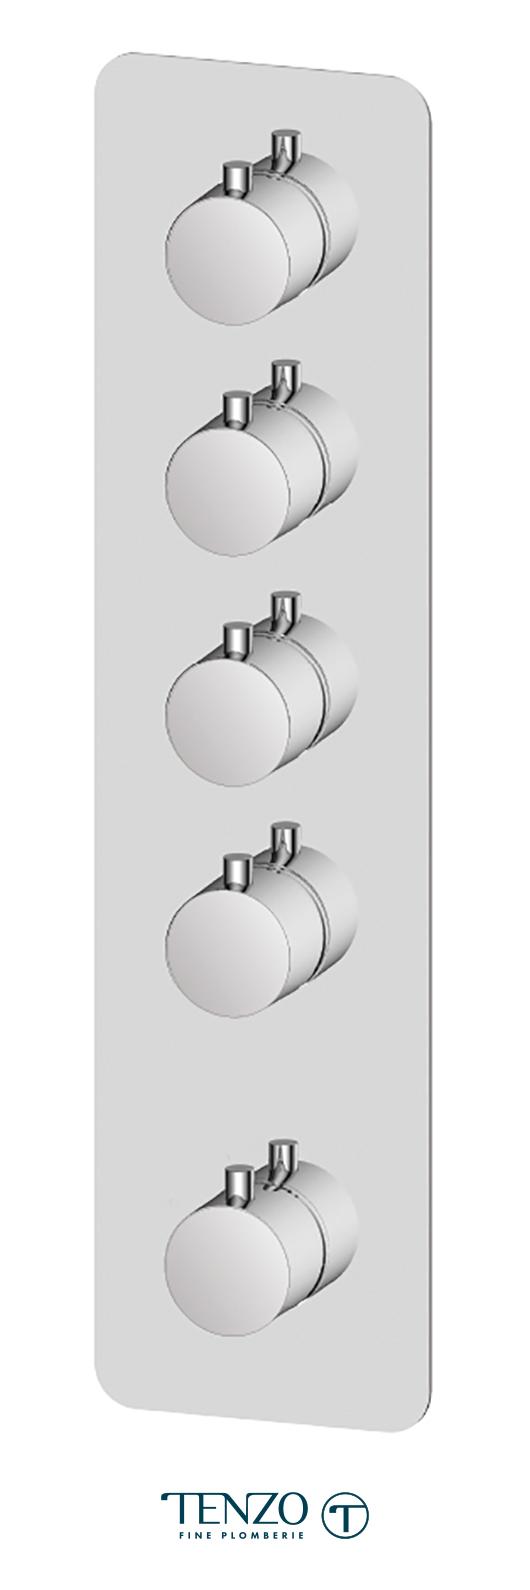 RUT44-CR - Extenza valve Rundo thermo. 4 functions chrome